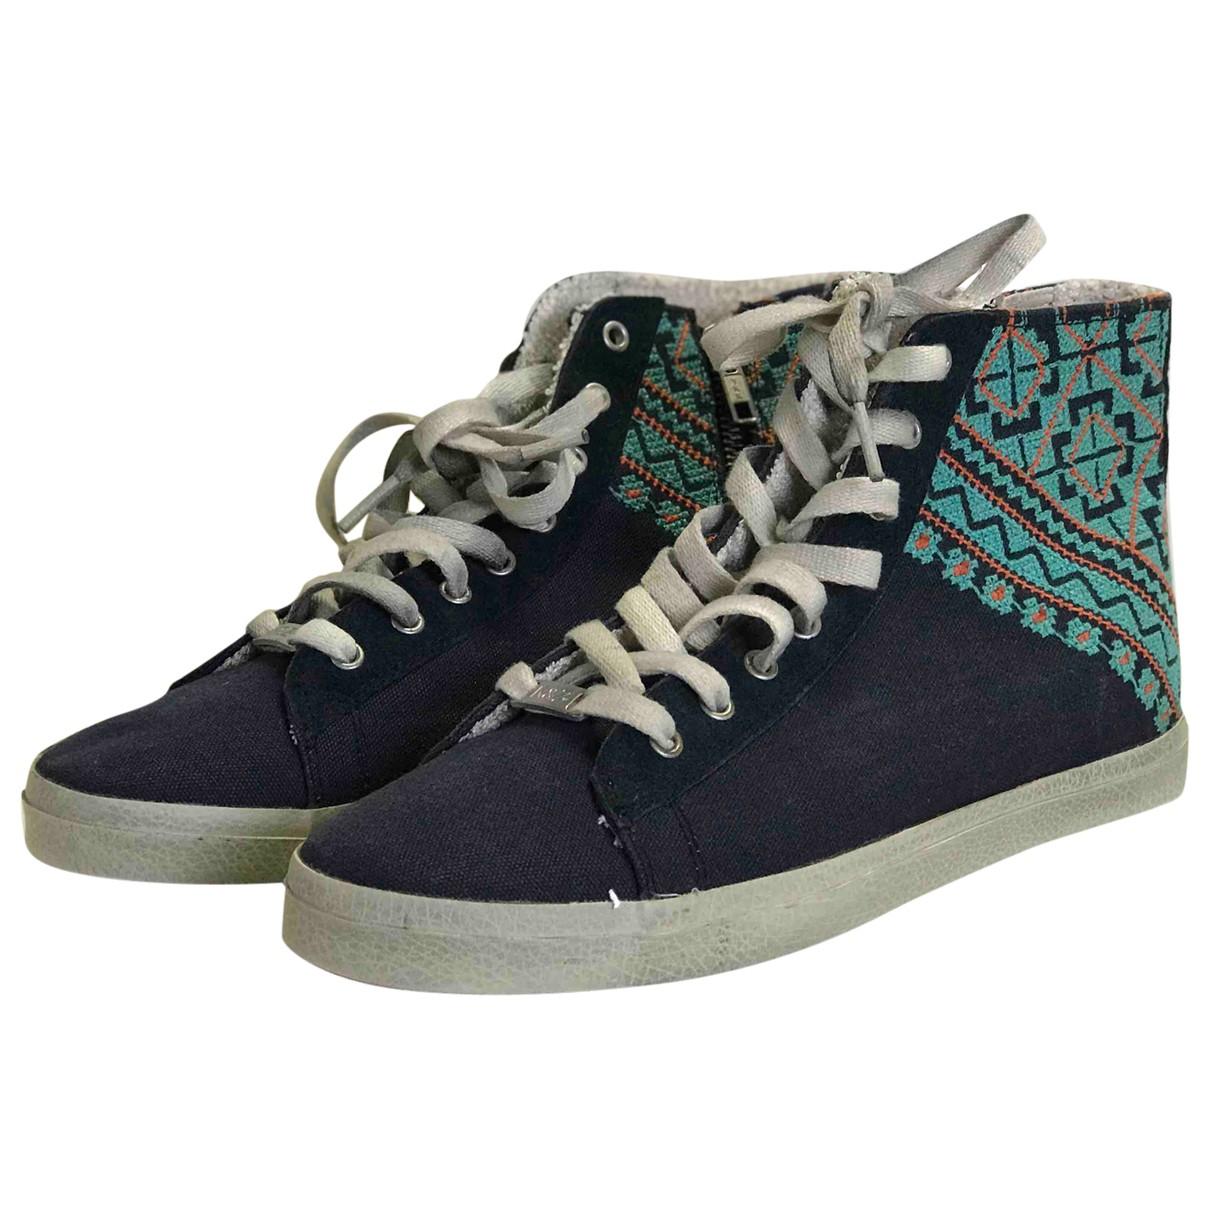 Kim & Zozi \N Sneakers in  Blau Leinen